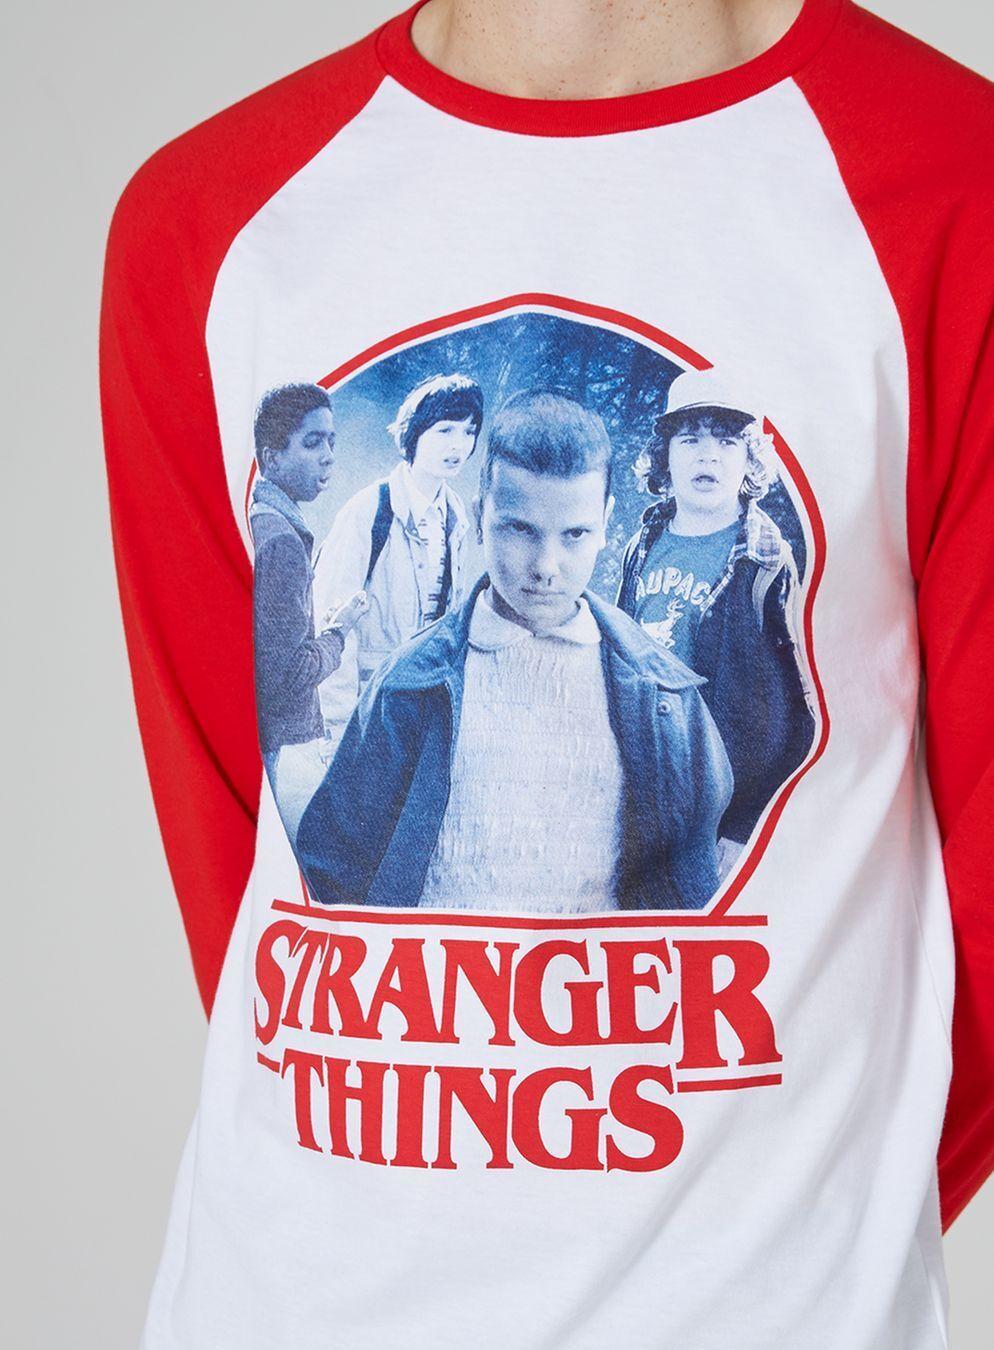 NEW Official Stranger Things x Topman Topshop ROT Raglan T-Shirt SIZE Large